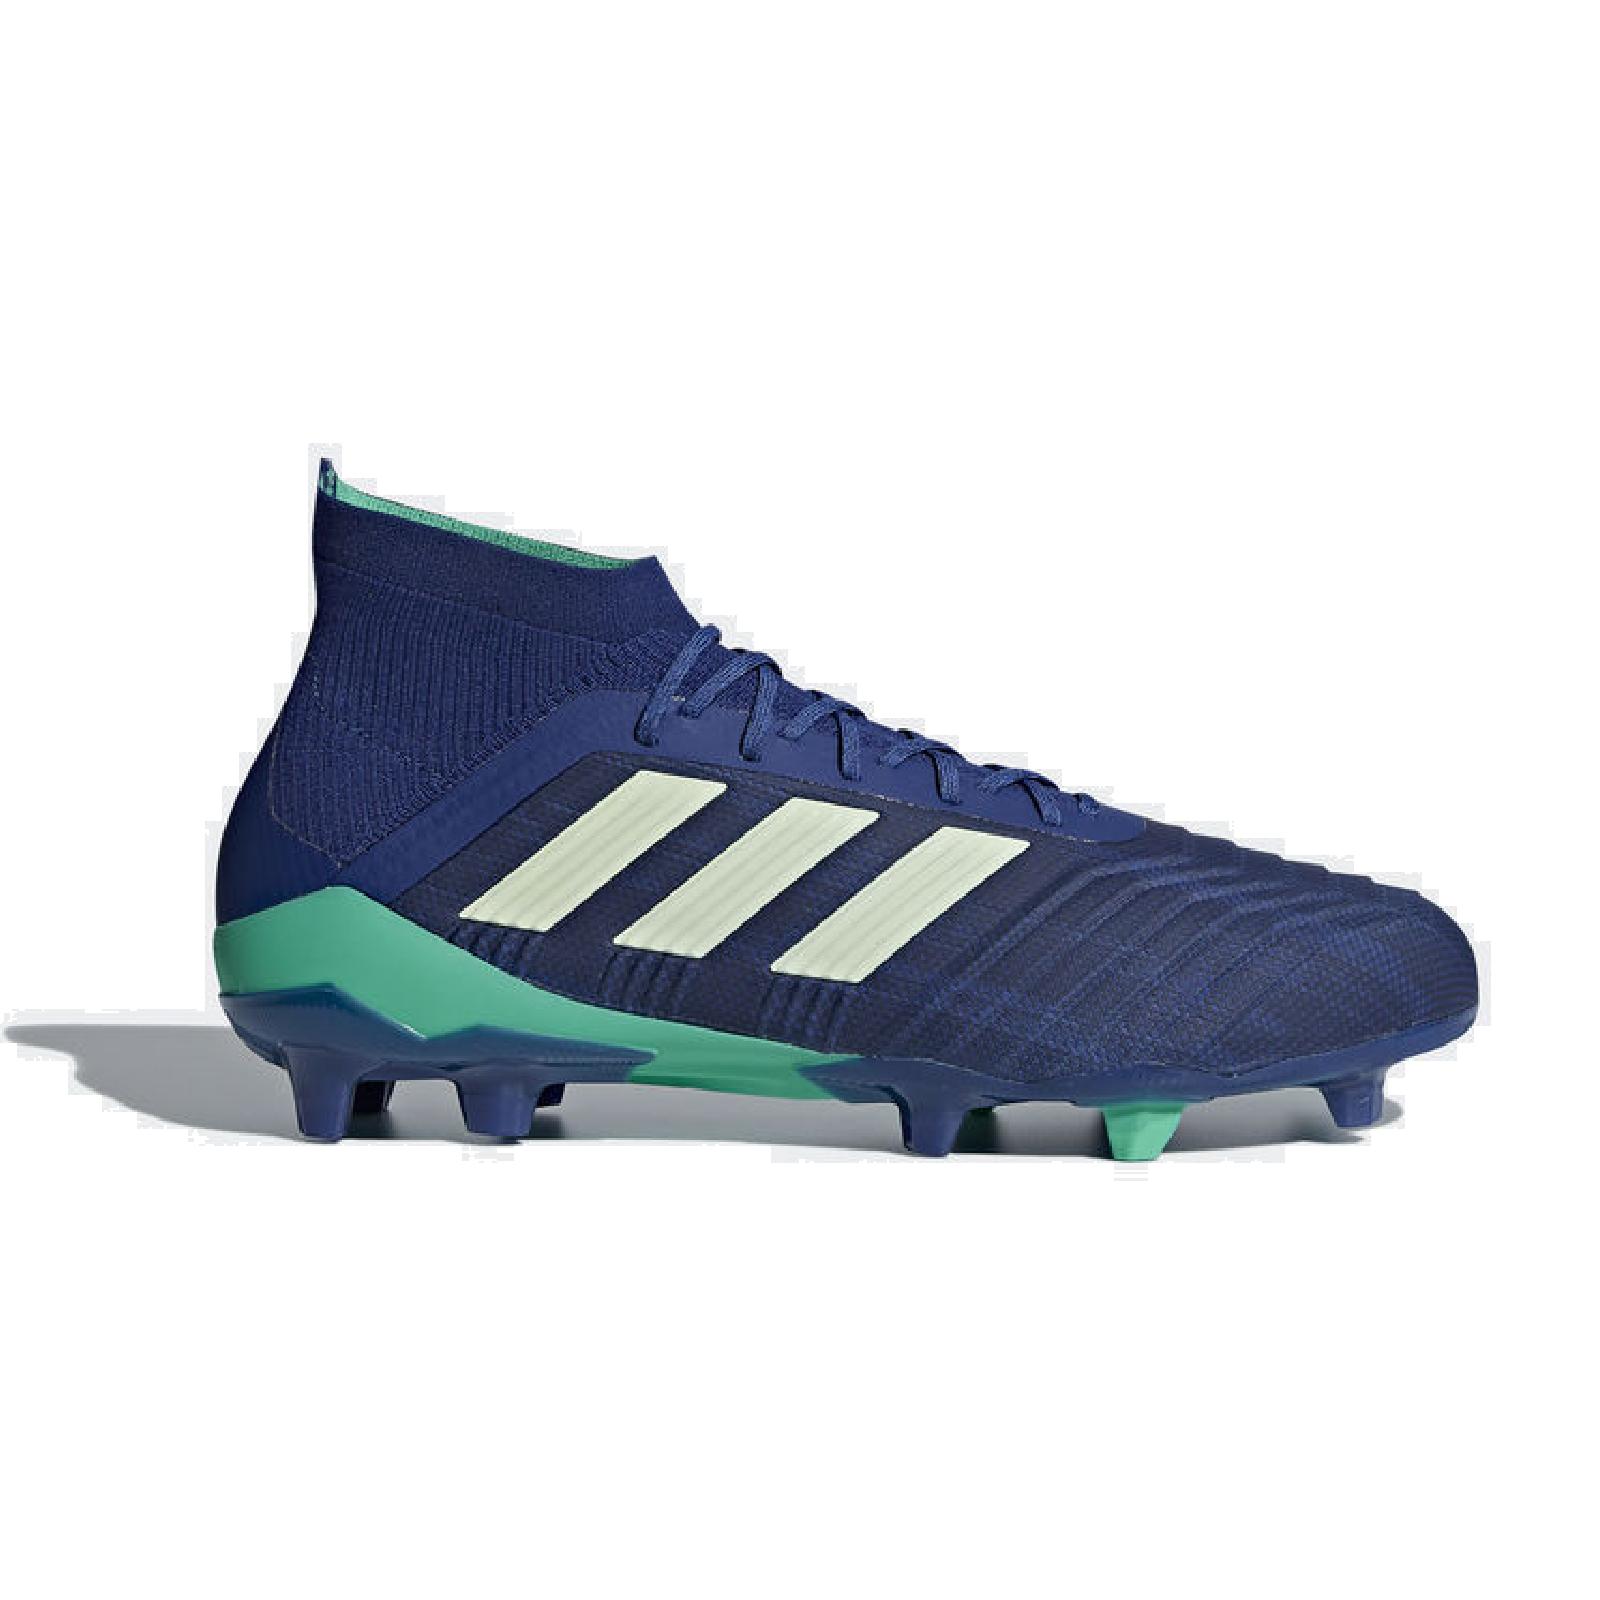 Adidas Predator 18 1 Fg Fussballschuhe Blau Grun Cm7411